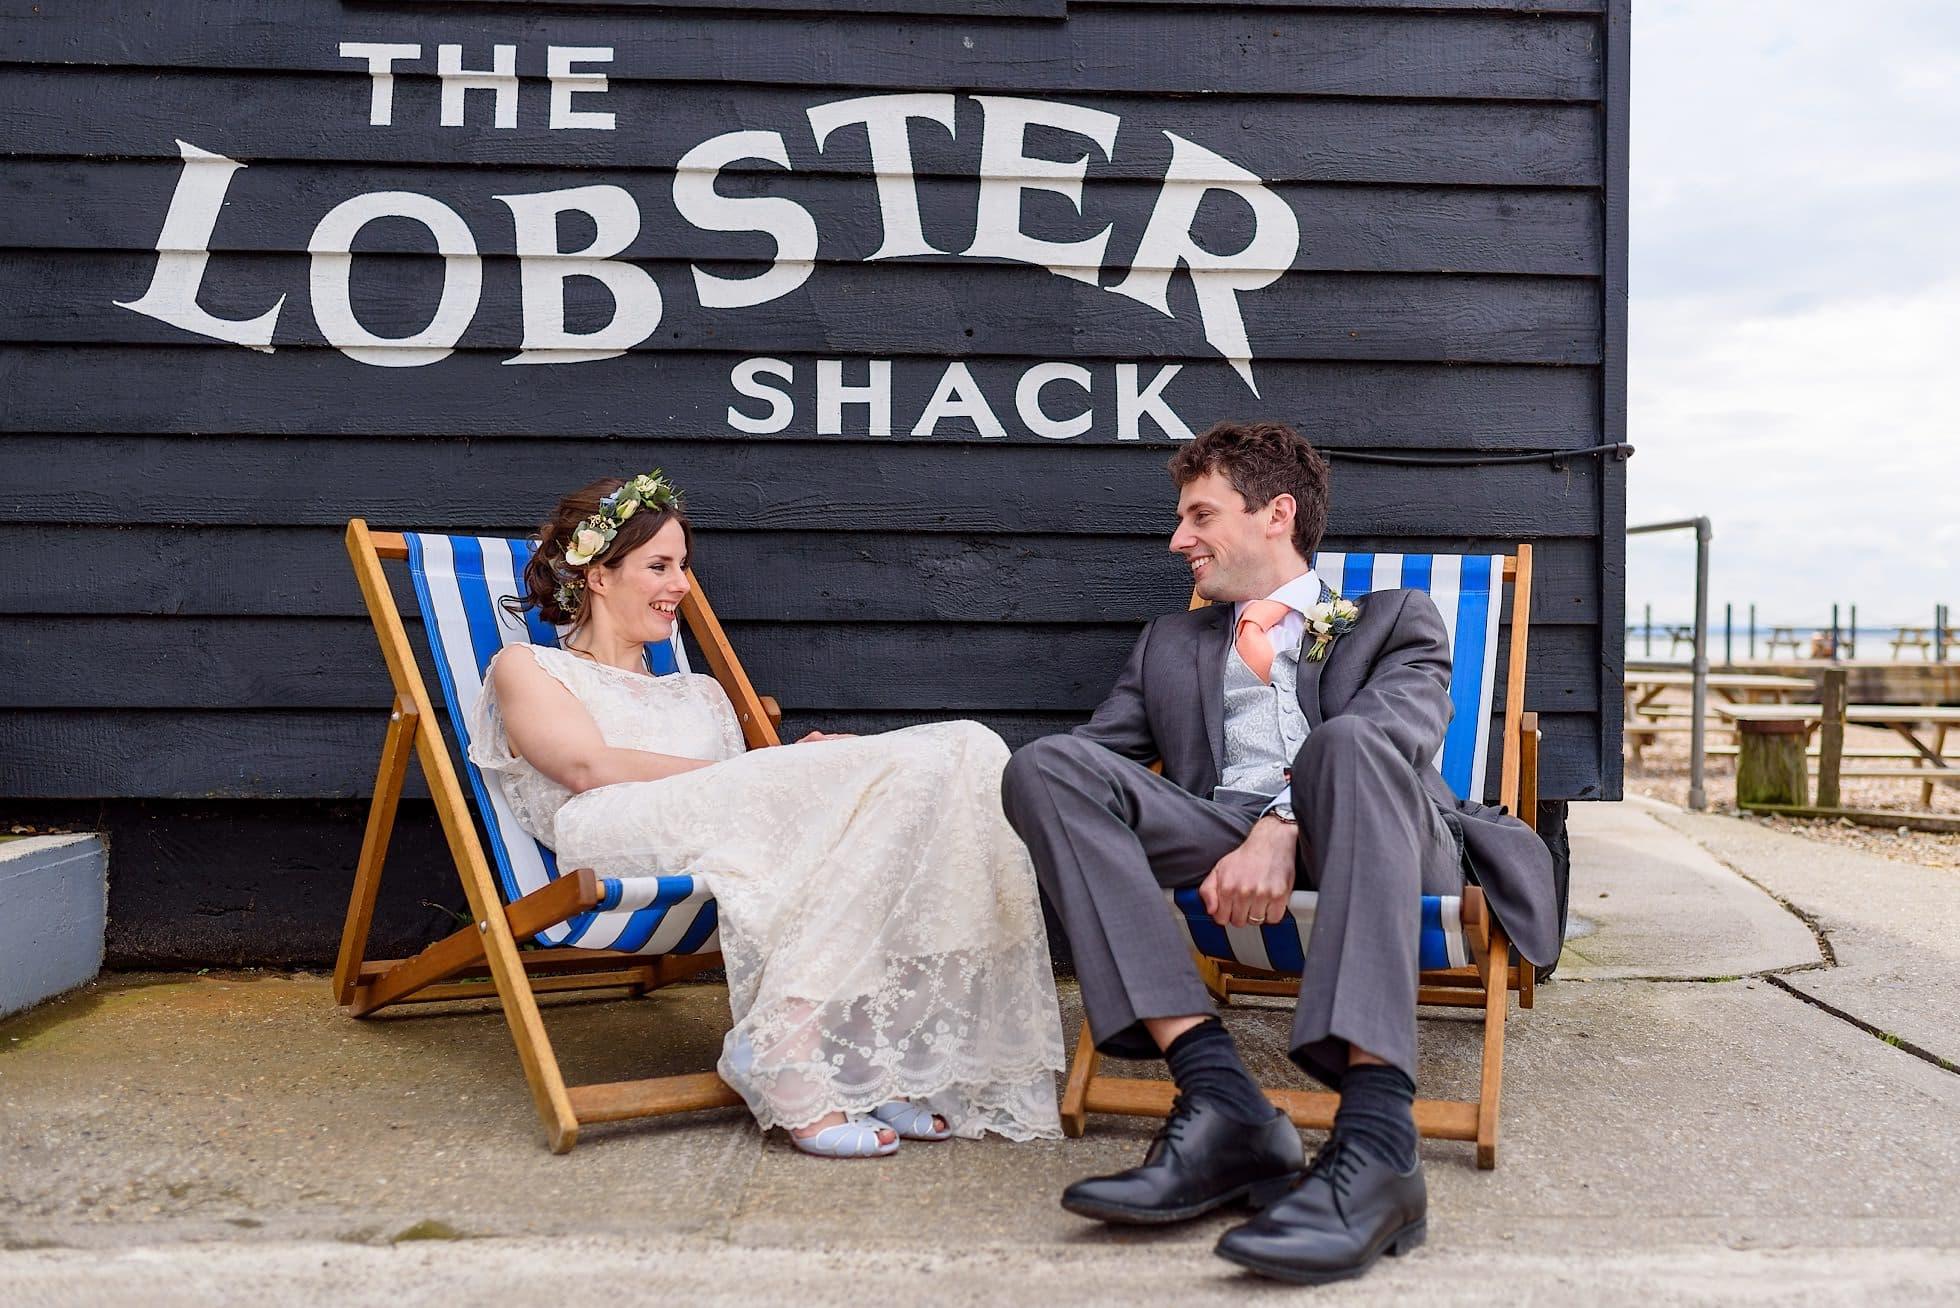 The Lobster Shack, Whitstable